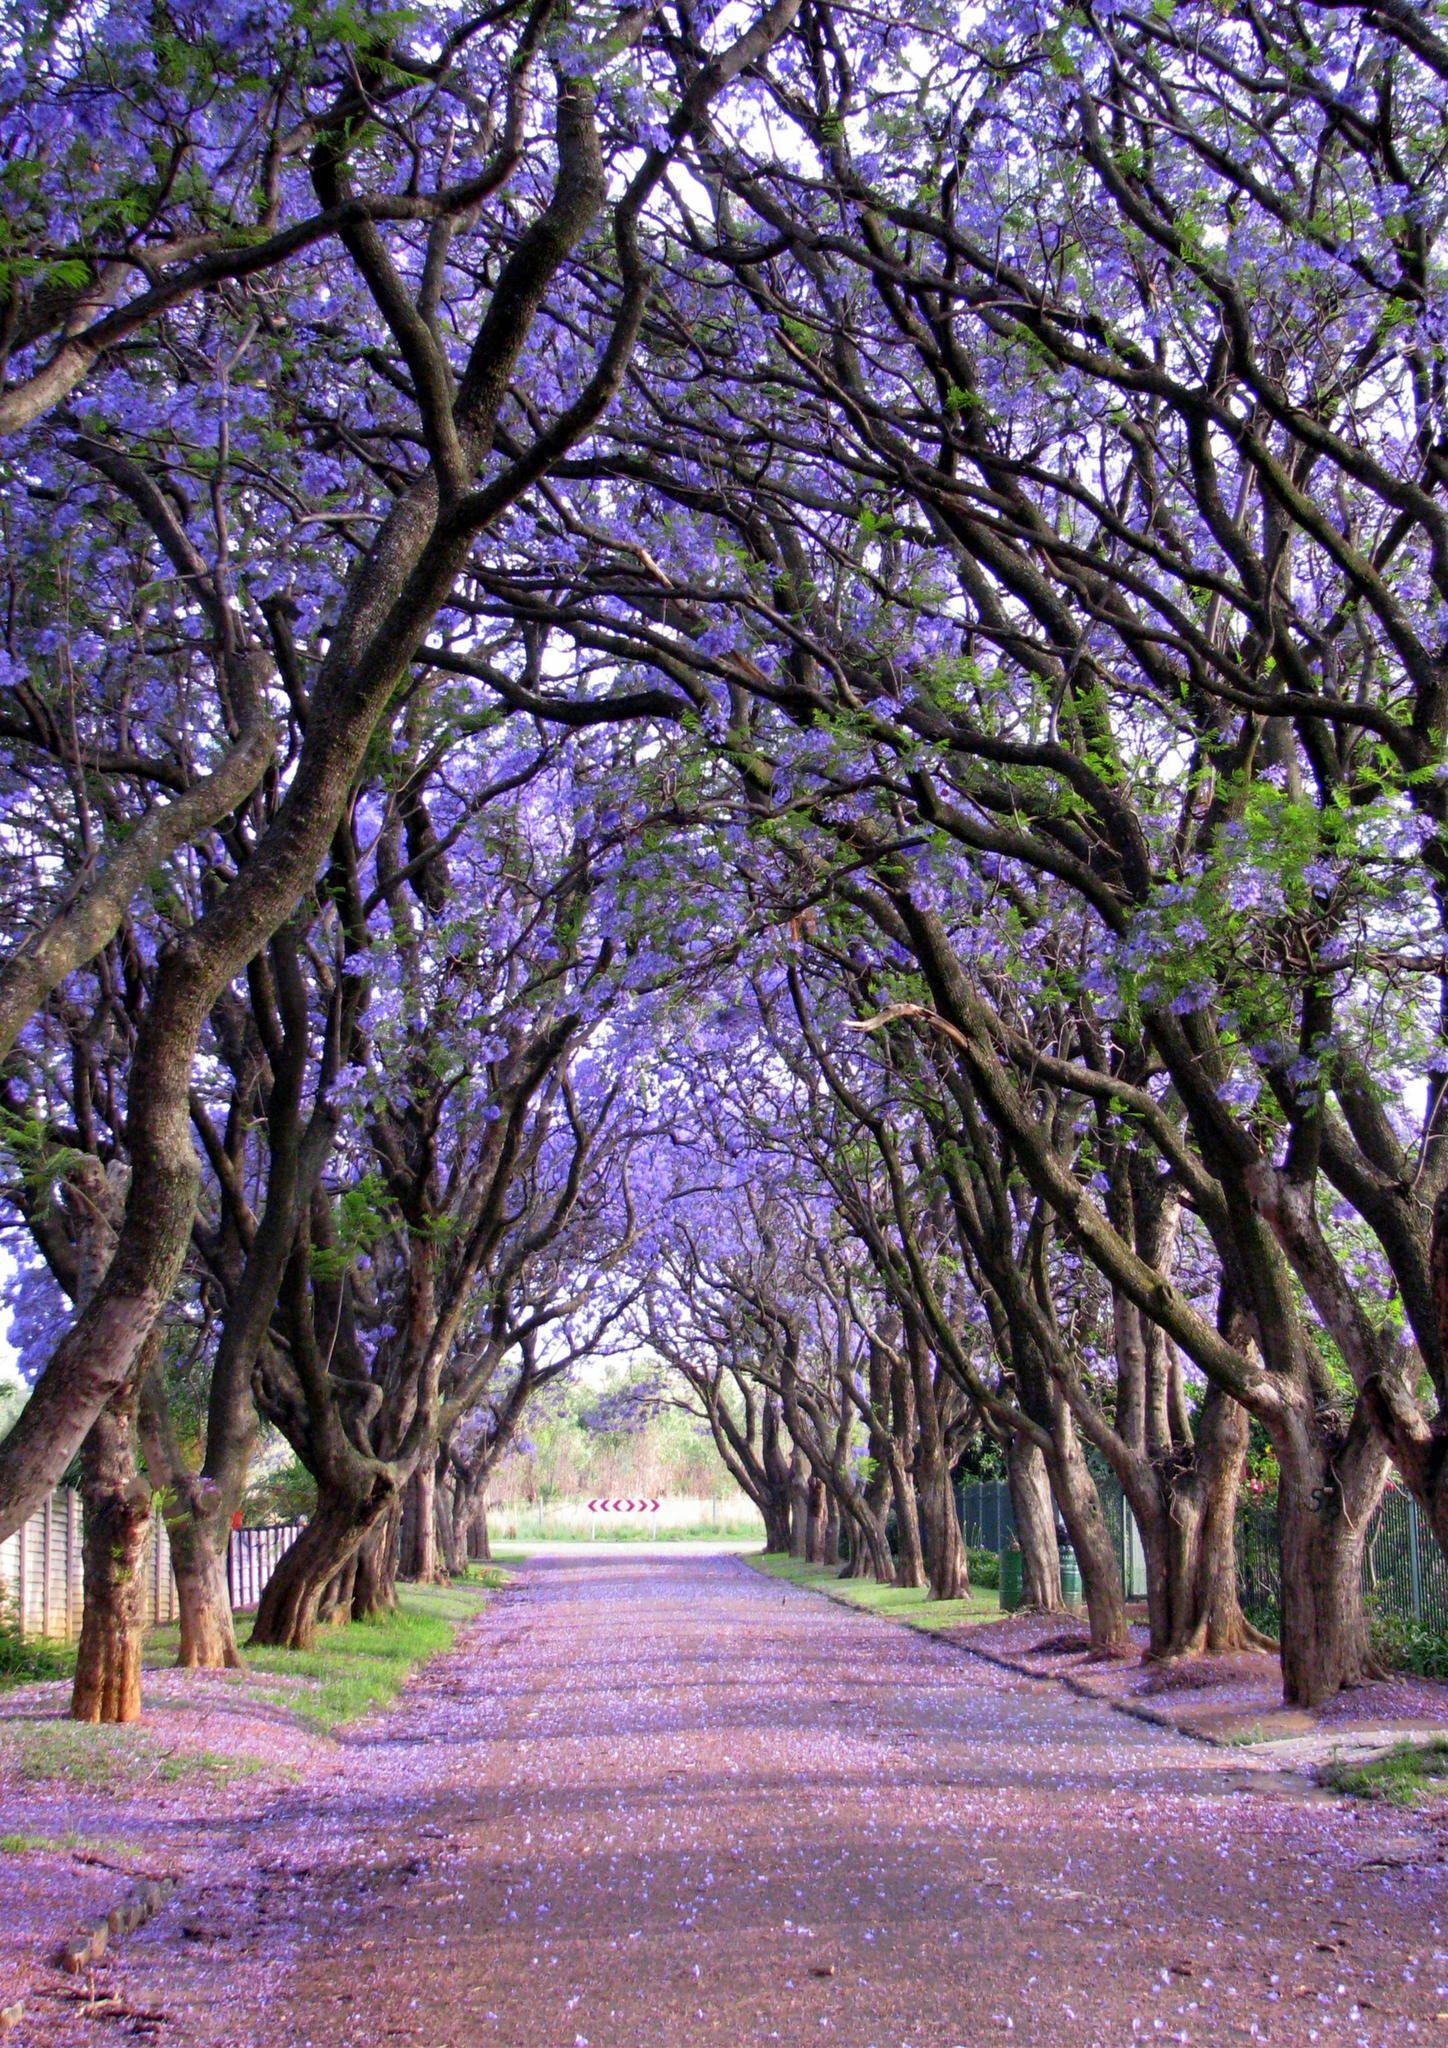 It is purple in Cullinan #Highveld #SouthAfrica